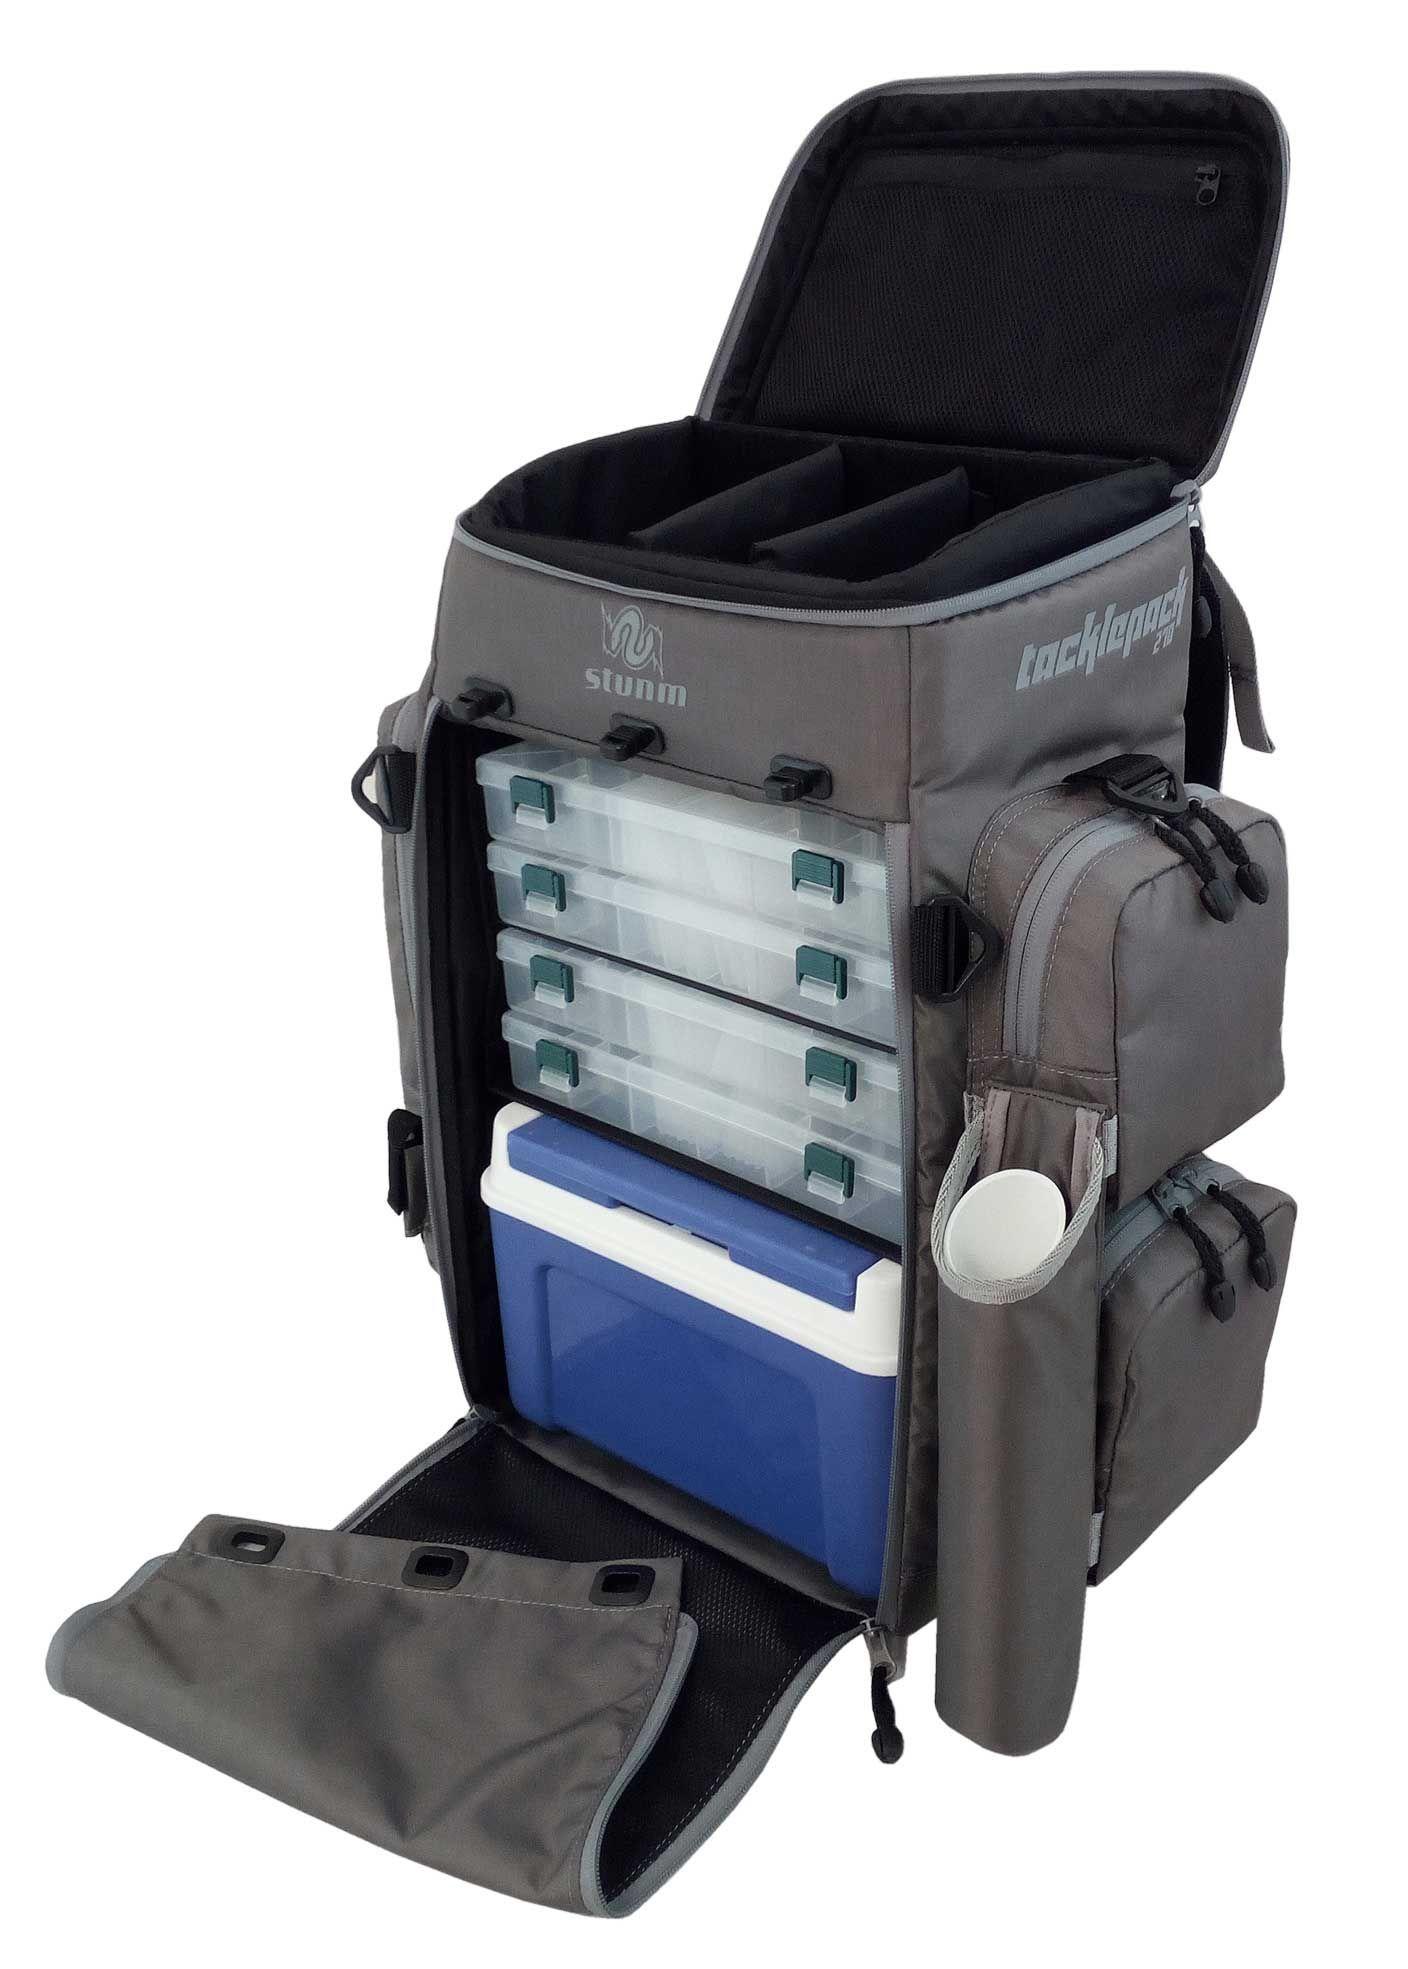 Backpack fishing chair - Stunm Tacklepack 270 Fishing Tackle Bag Backpack Tackle Bags For Angling Tackle